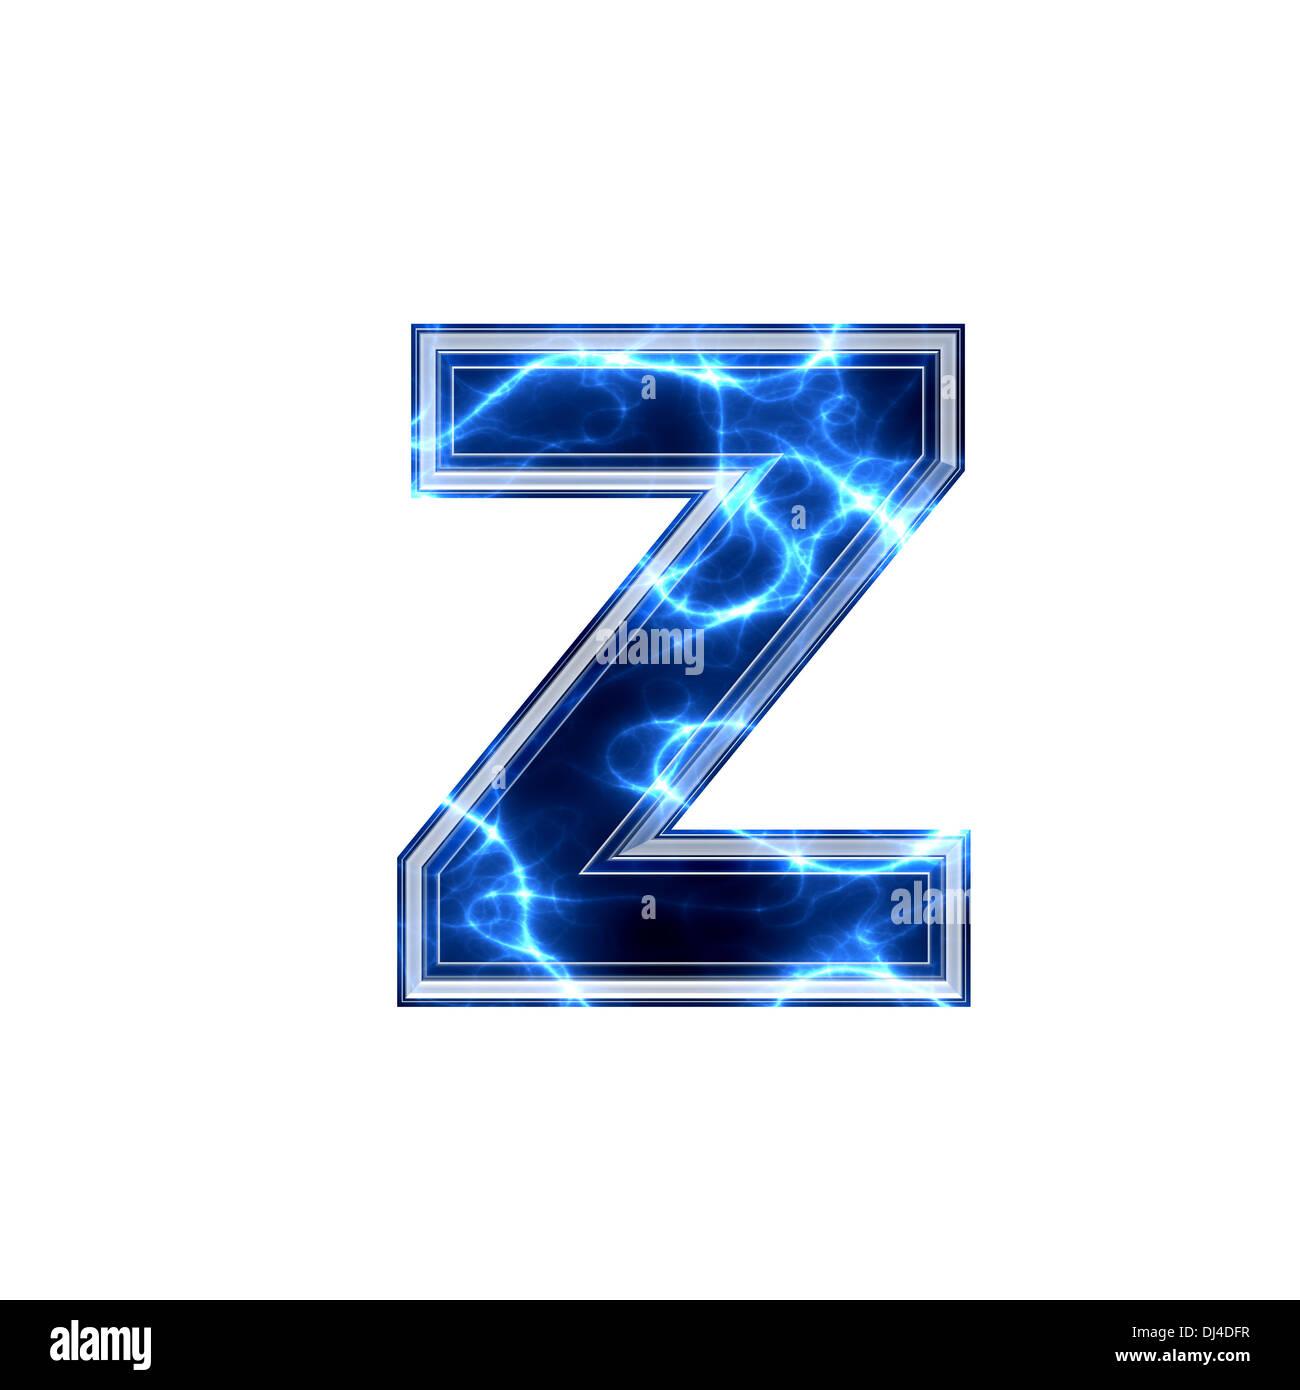 electric 3d letter - z Stock Photo: 62793355 - Alamy